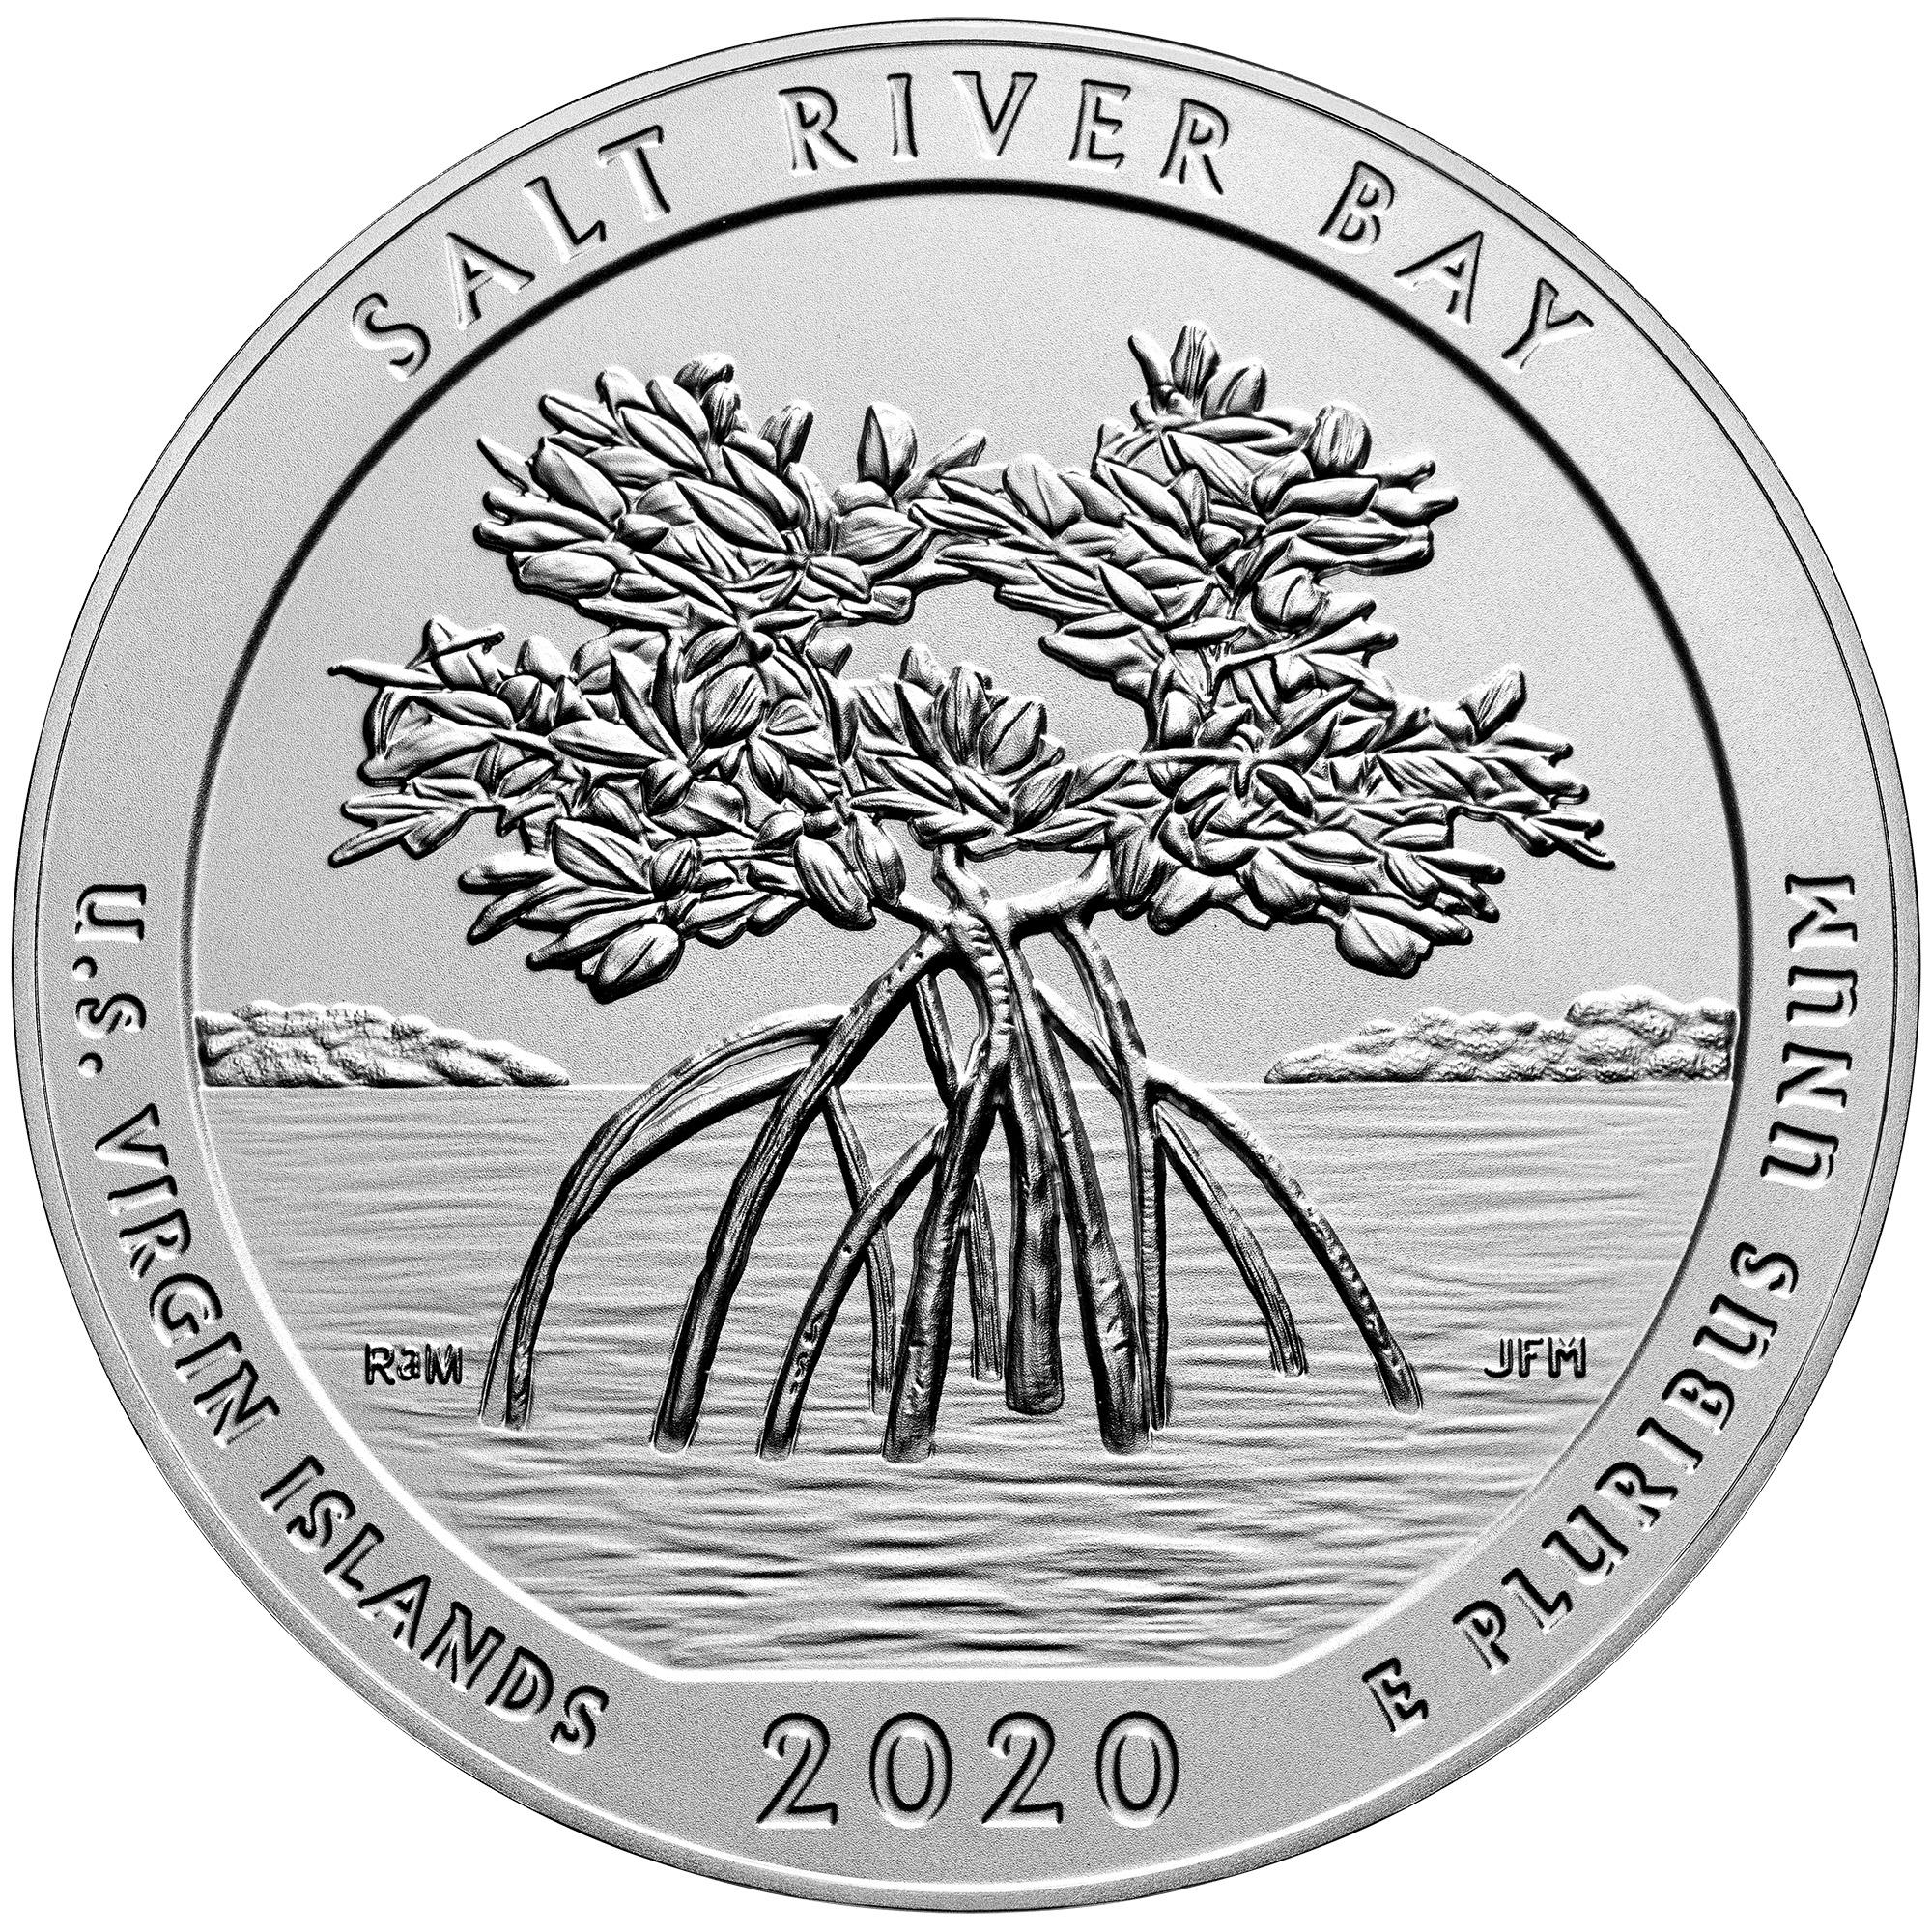 2020 America the Beautiful Quarters Five Ounce Silver Uncirculated Coin Salt River Bay U.S. Virgin Islands Reverse